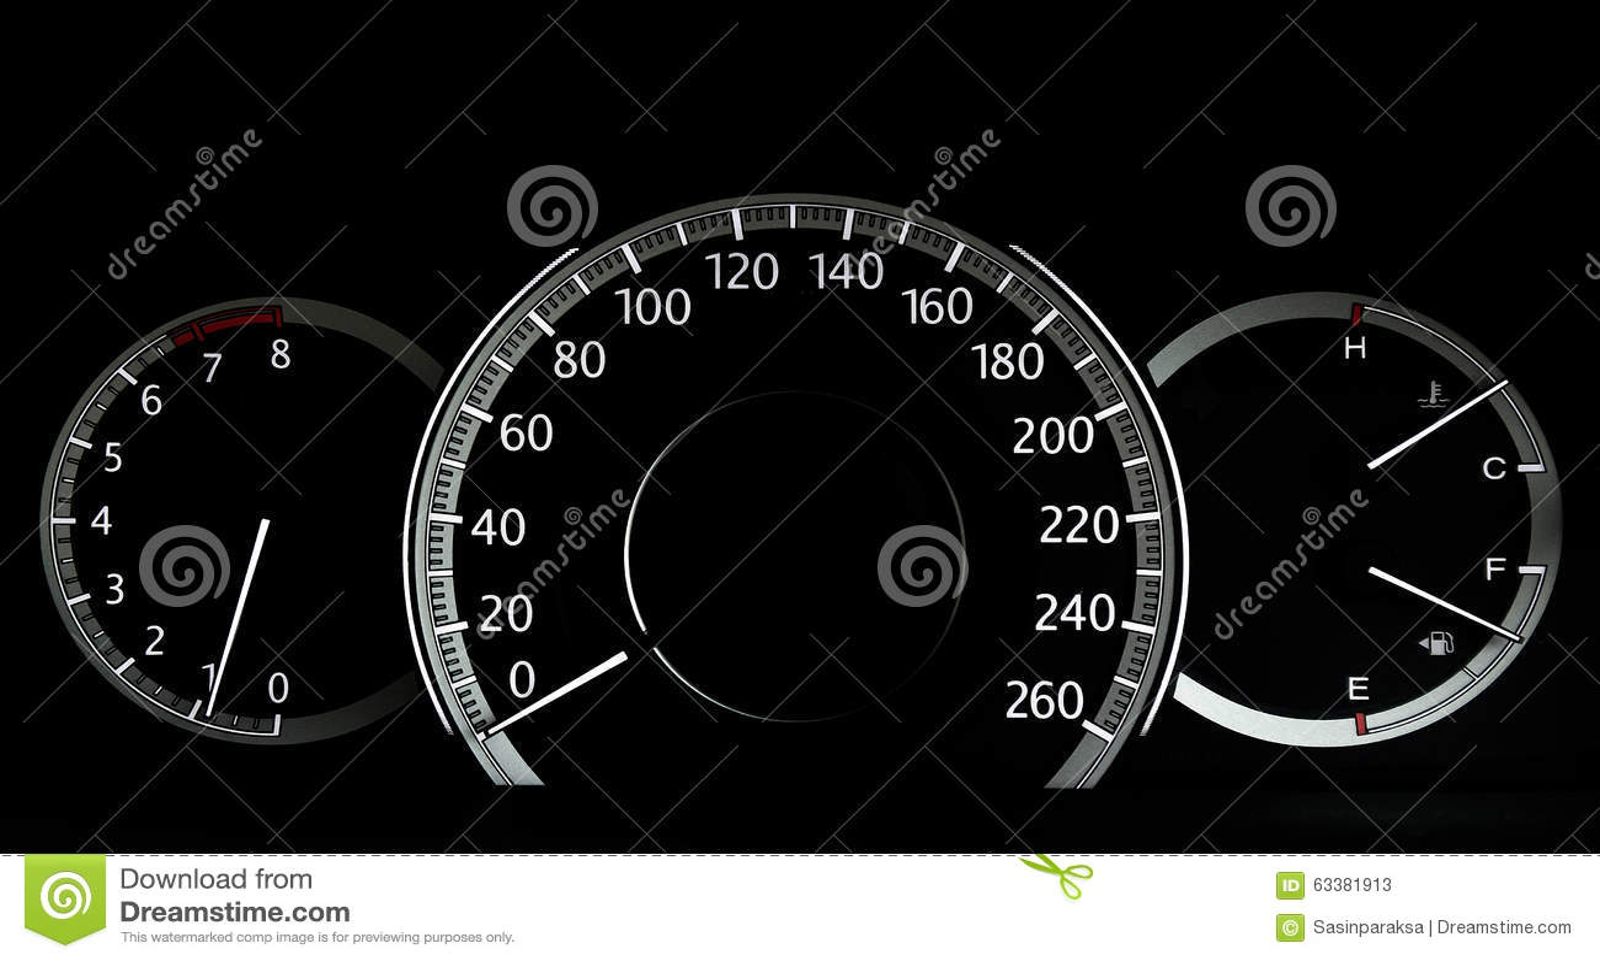 Modern Car Instruments Panel Stock Image